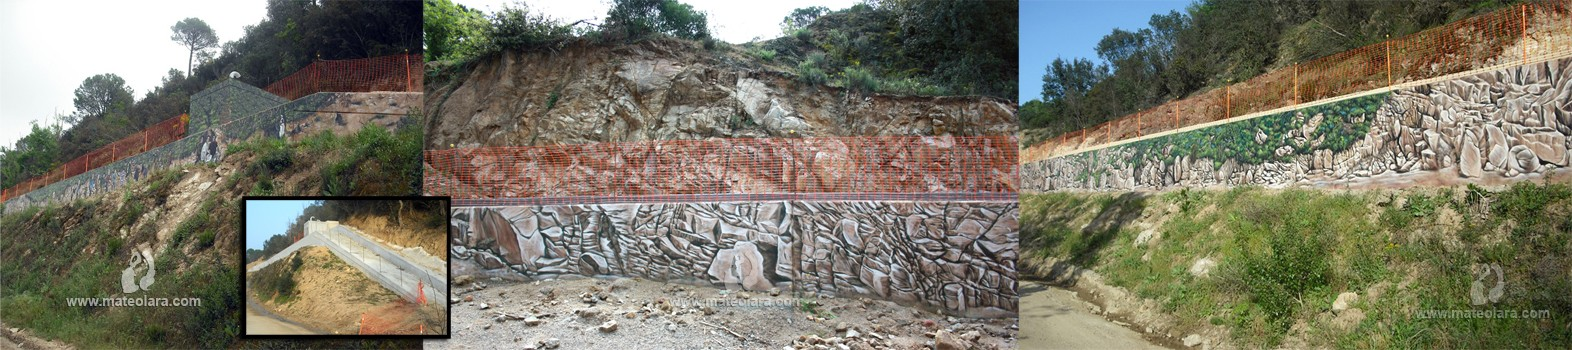 Trompe l'oeil CAMUFLAJE – 150 x 2m.(300 m2), Fogars de la Selva (Spain). 2011 Copyright [Base de pintura plástica y espray]